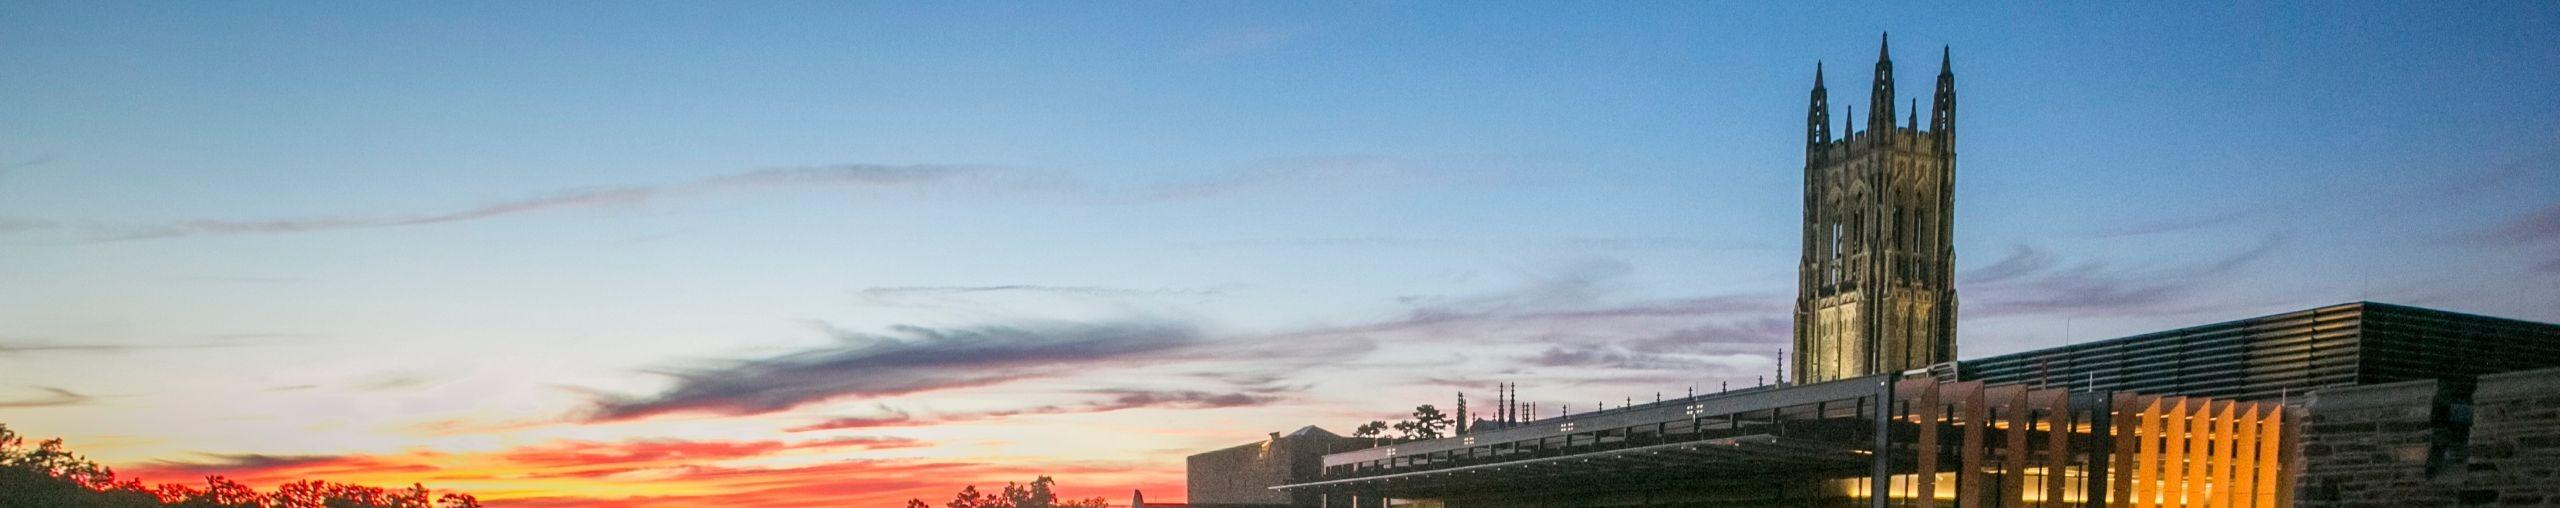 west union at twilight